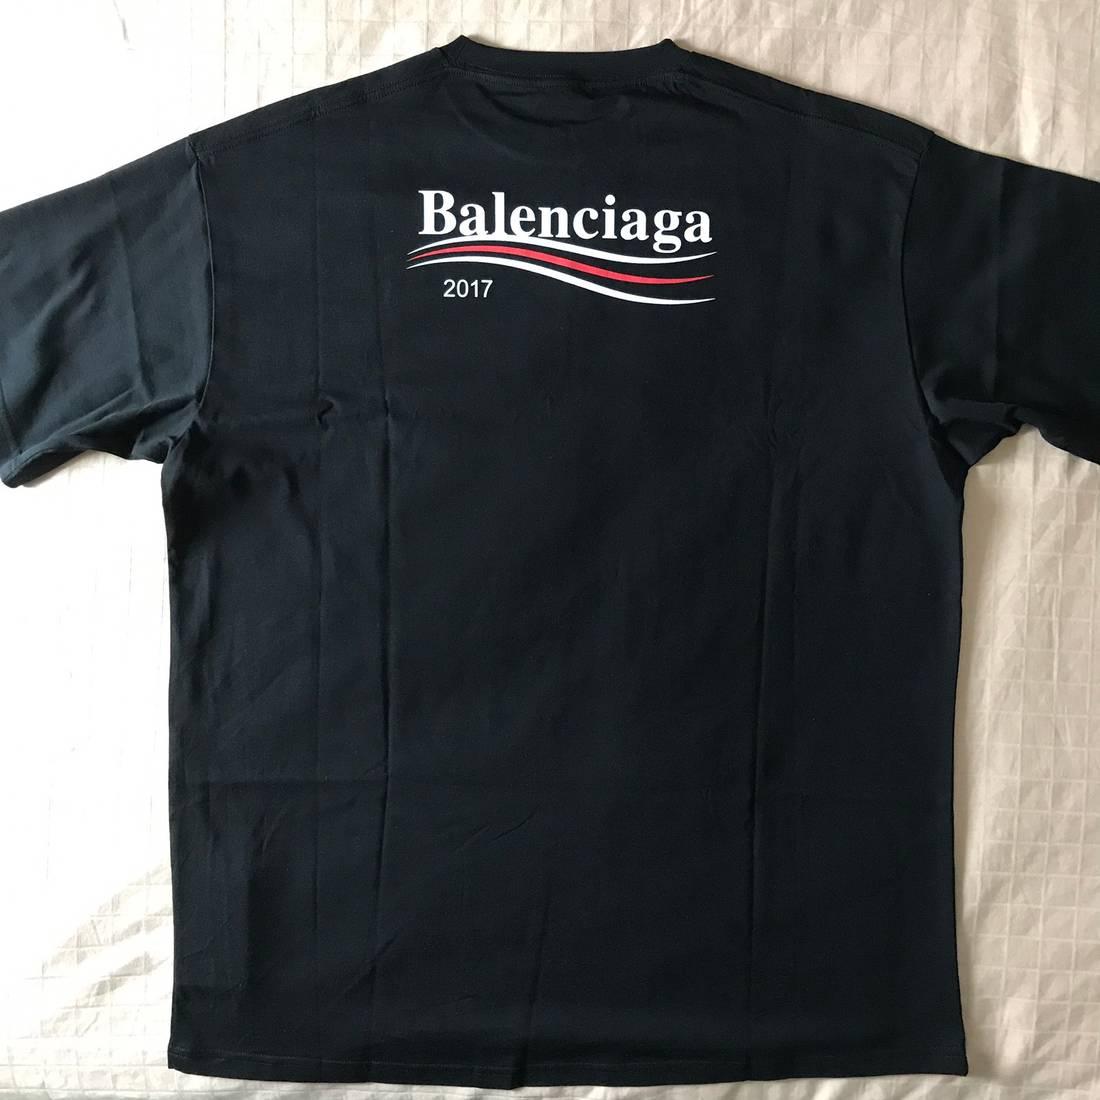 f3125604e Balenciaga Campaign Logo T-shirt Black 2017 | Grailed